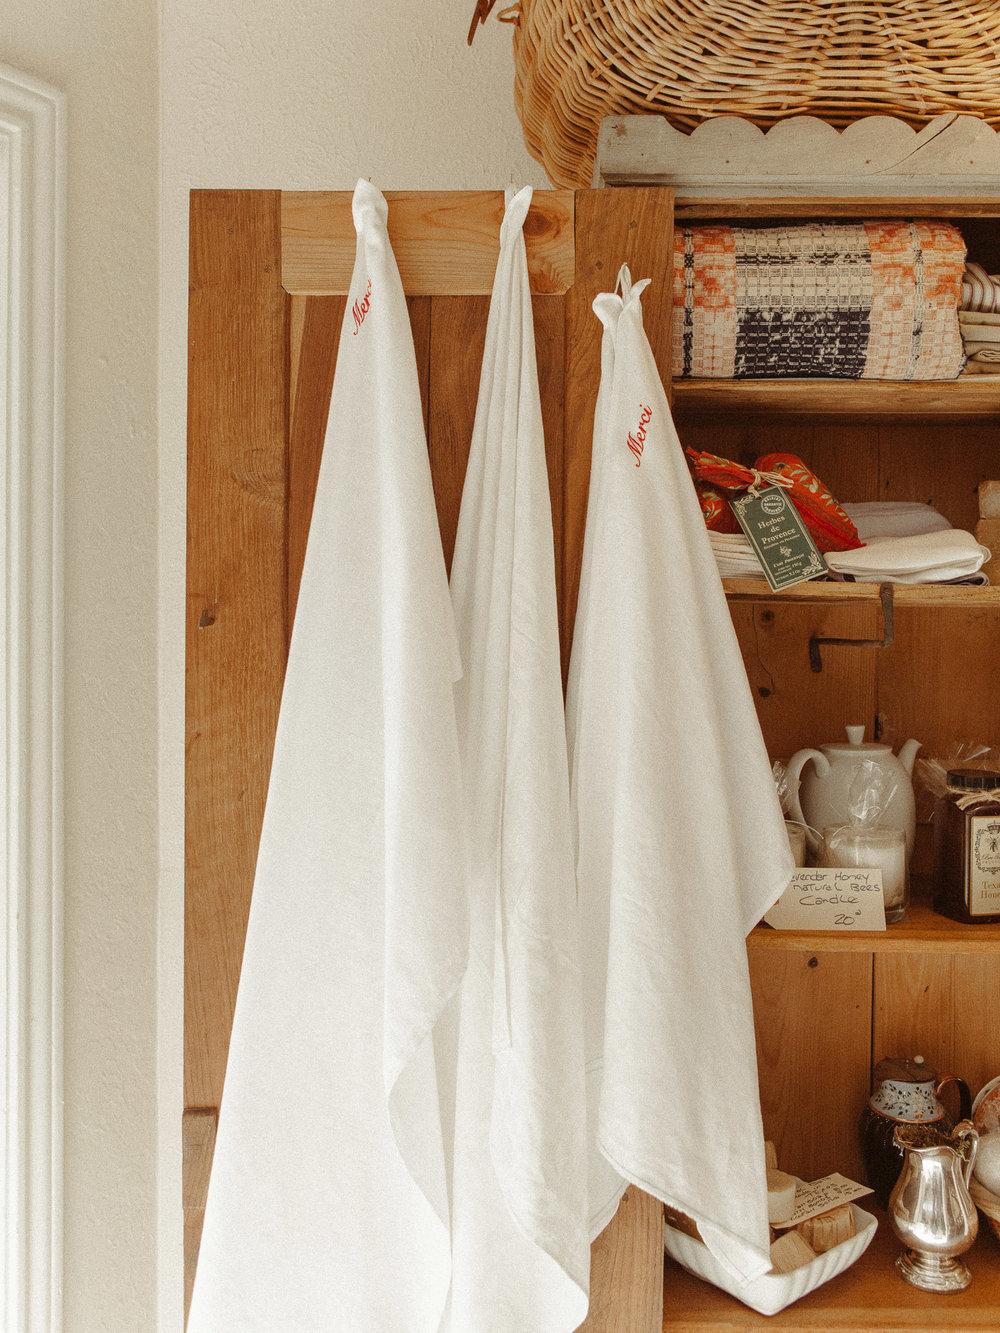 French Linen Long Towel in 'Merci' $30 -